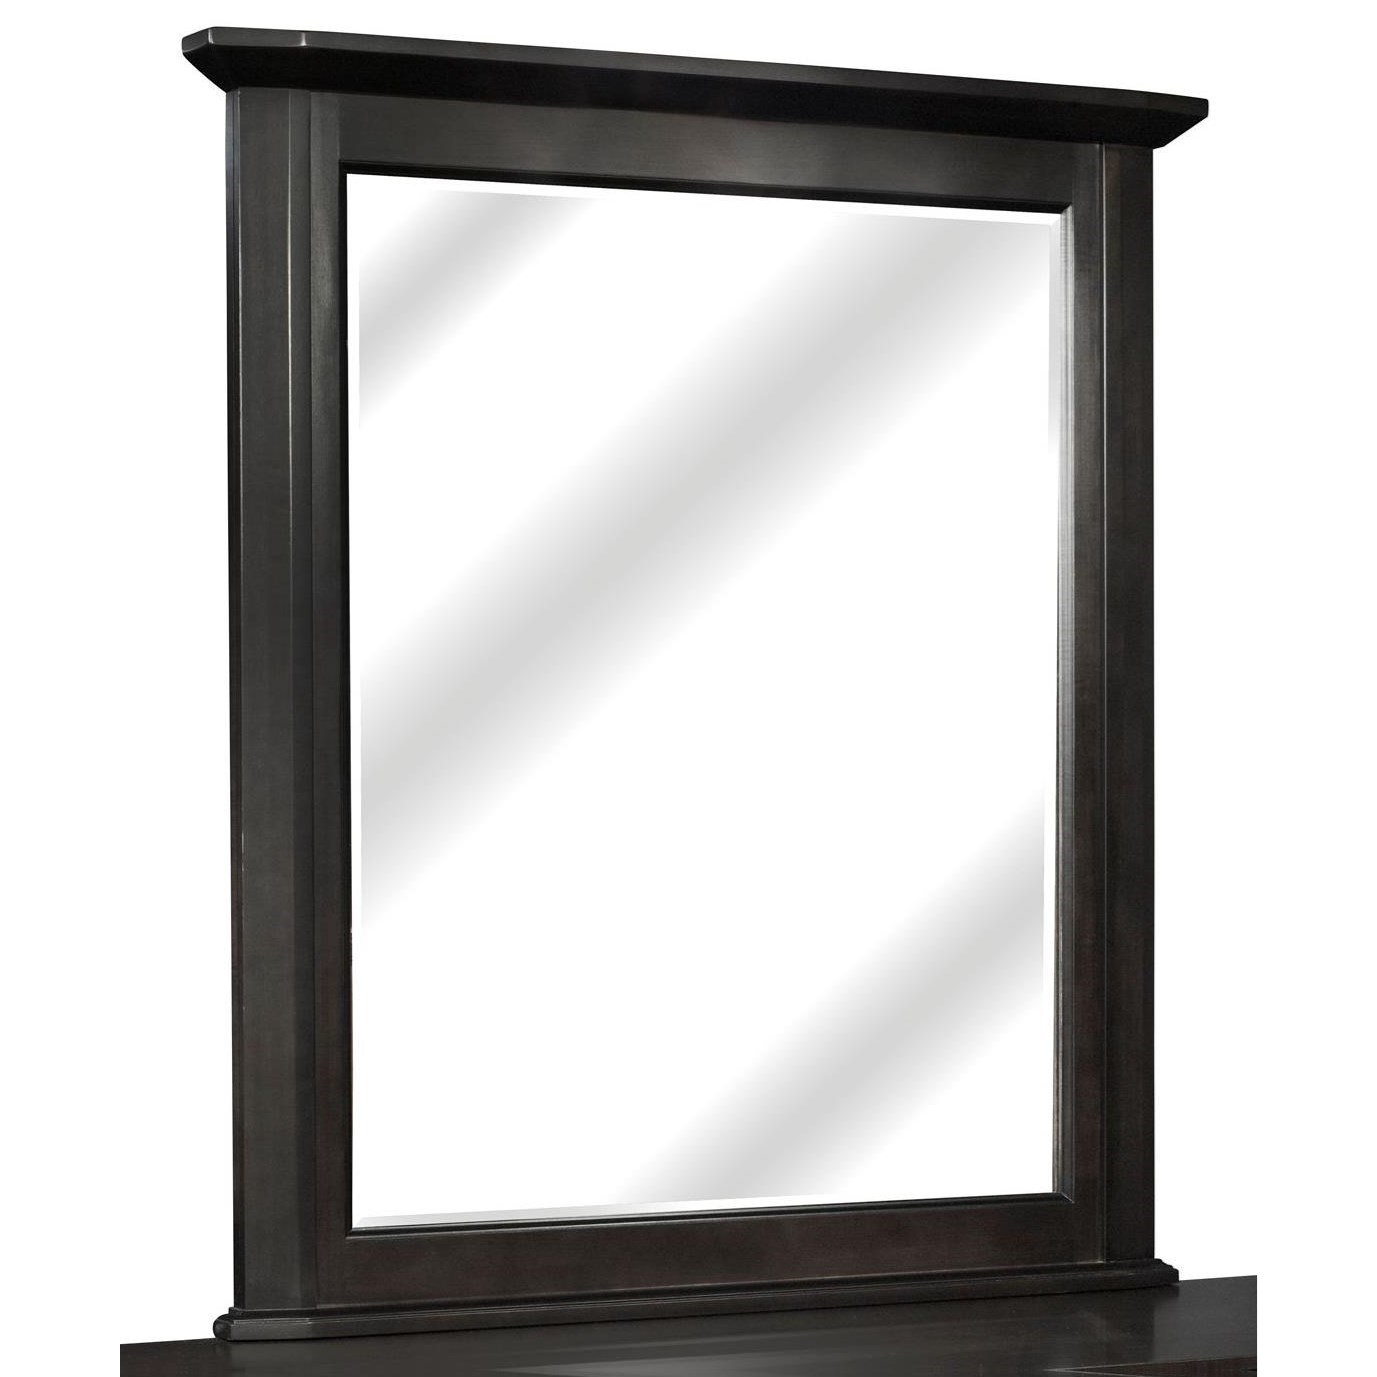 Urbane Vertical Frame Mirror by perfectbalance by Durham Furniture at Stoney Creek Furniture